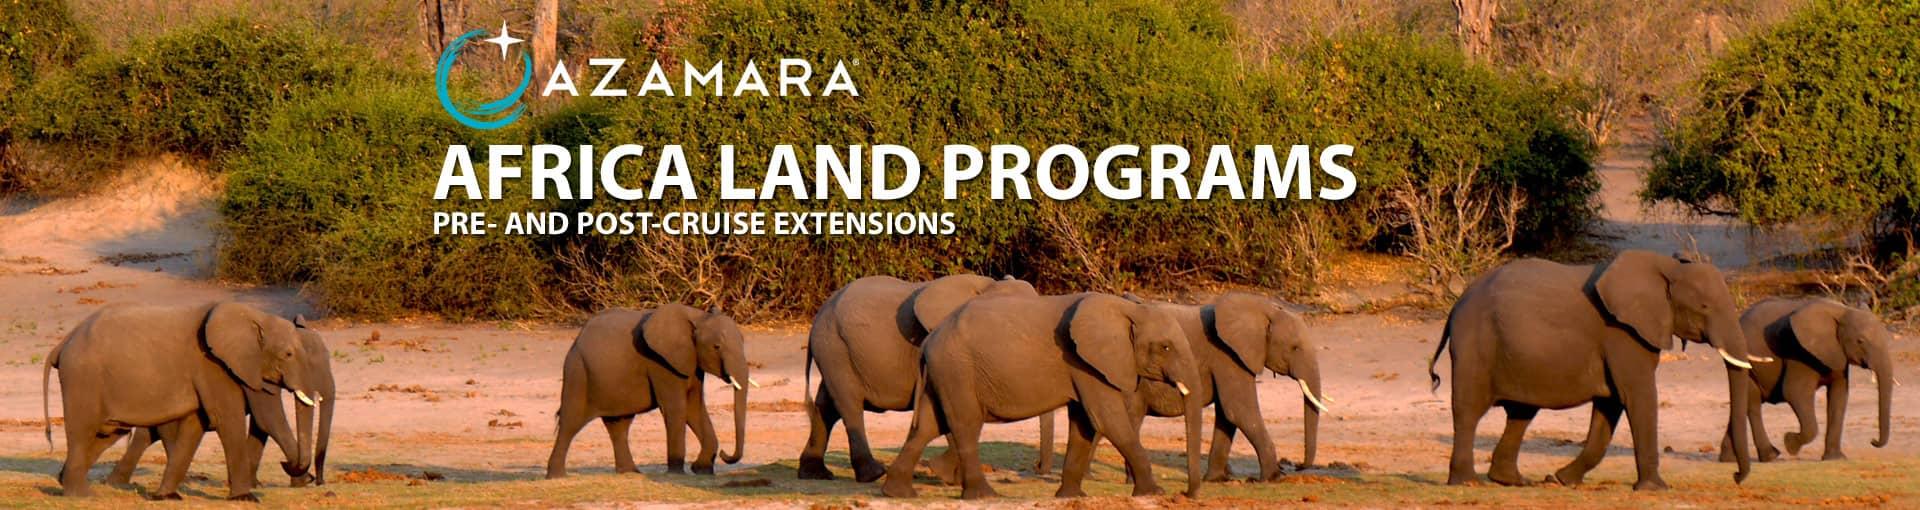 Azamara Africa Land Programs